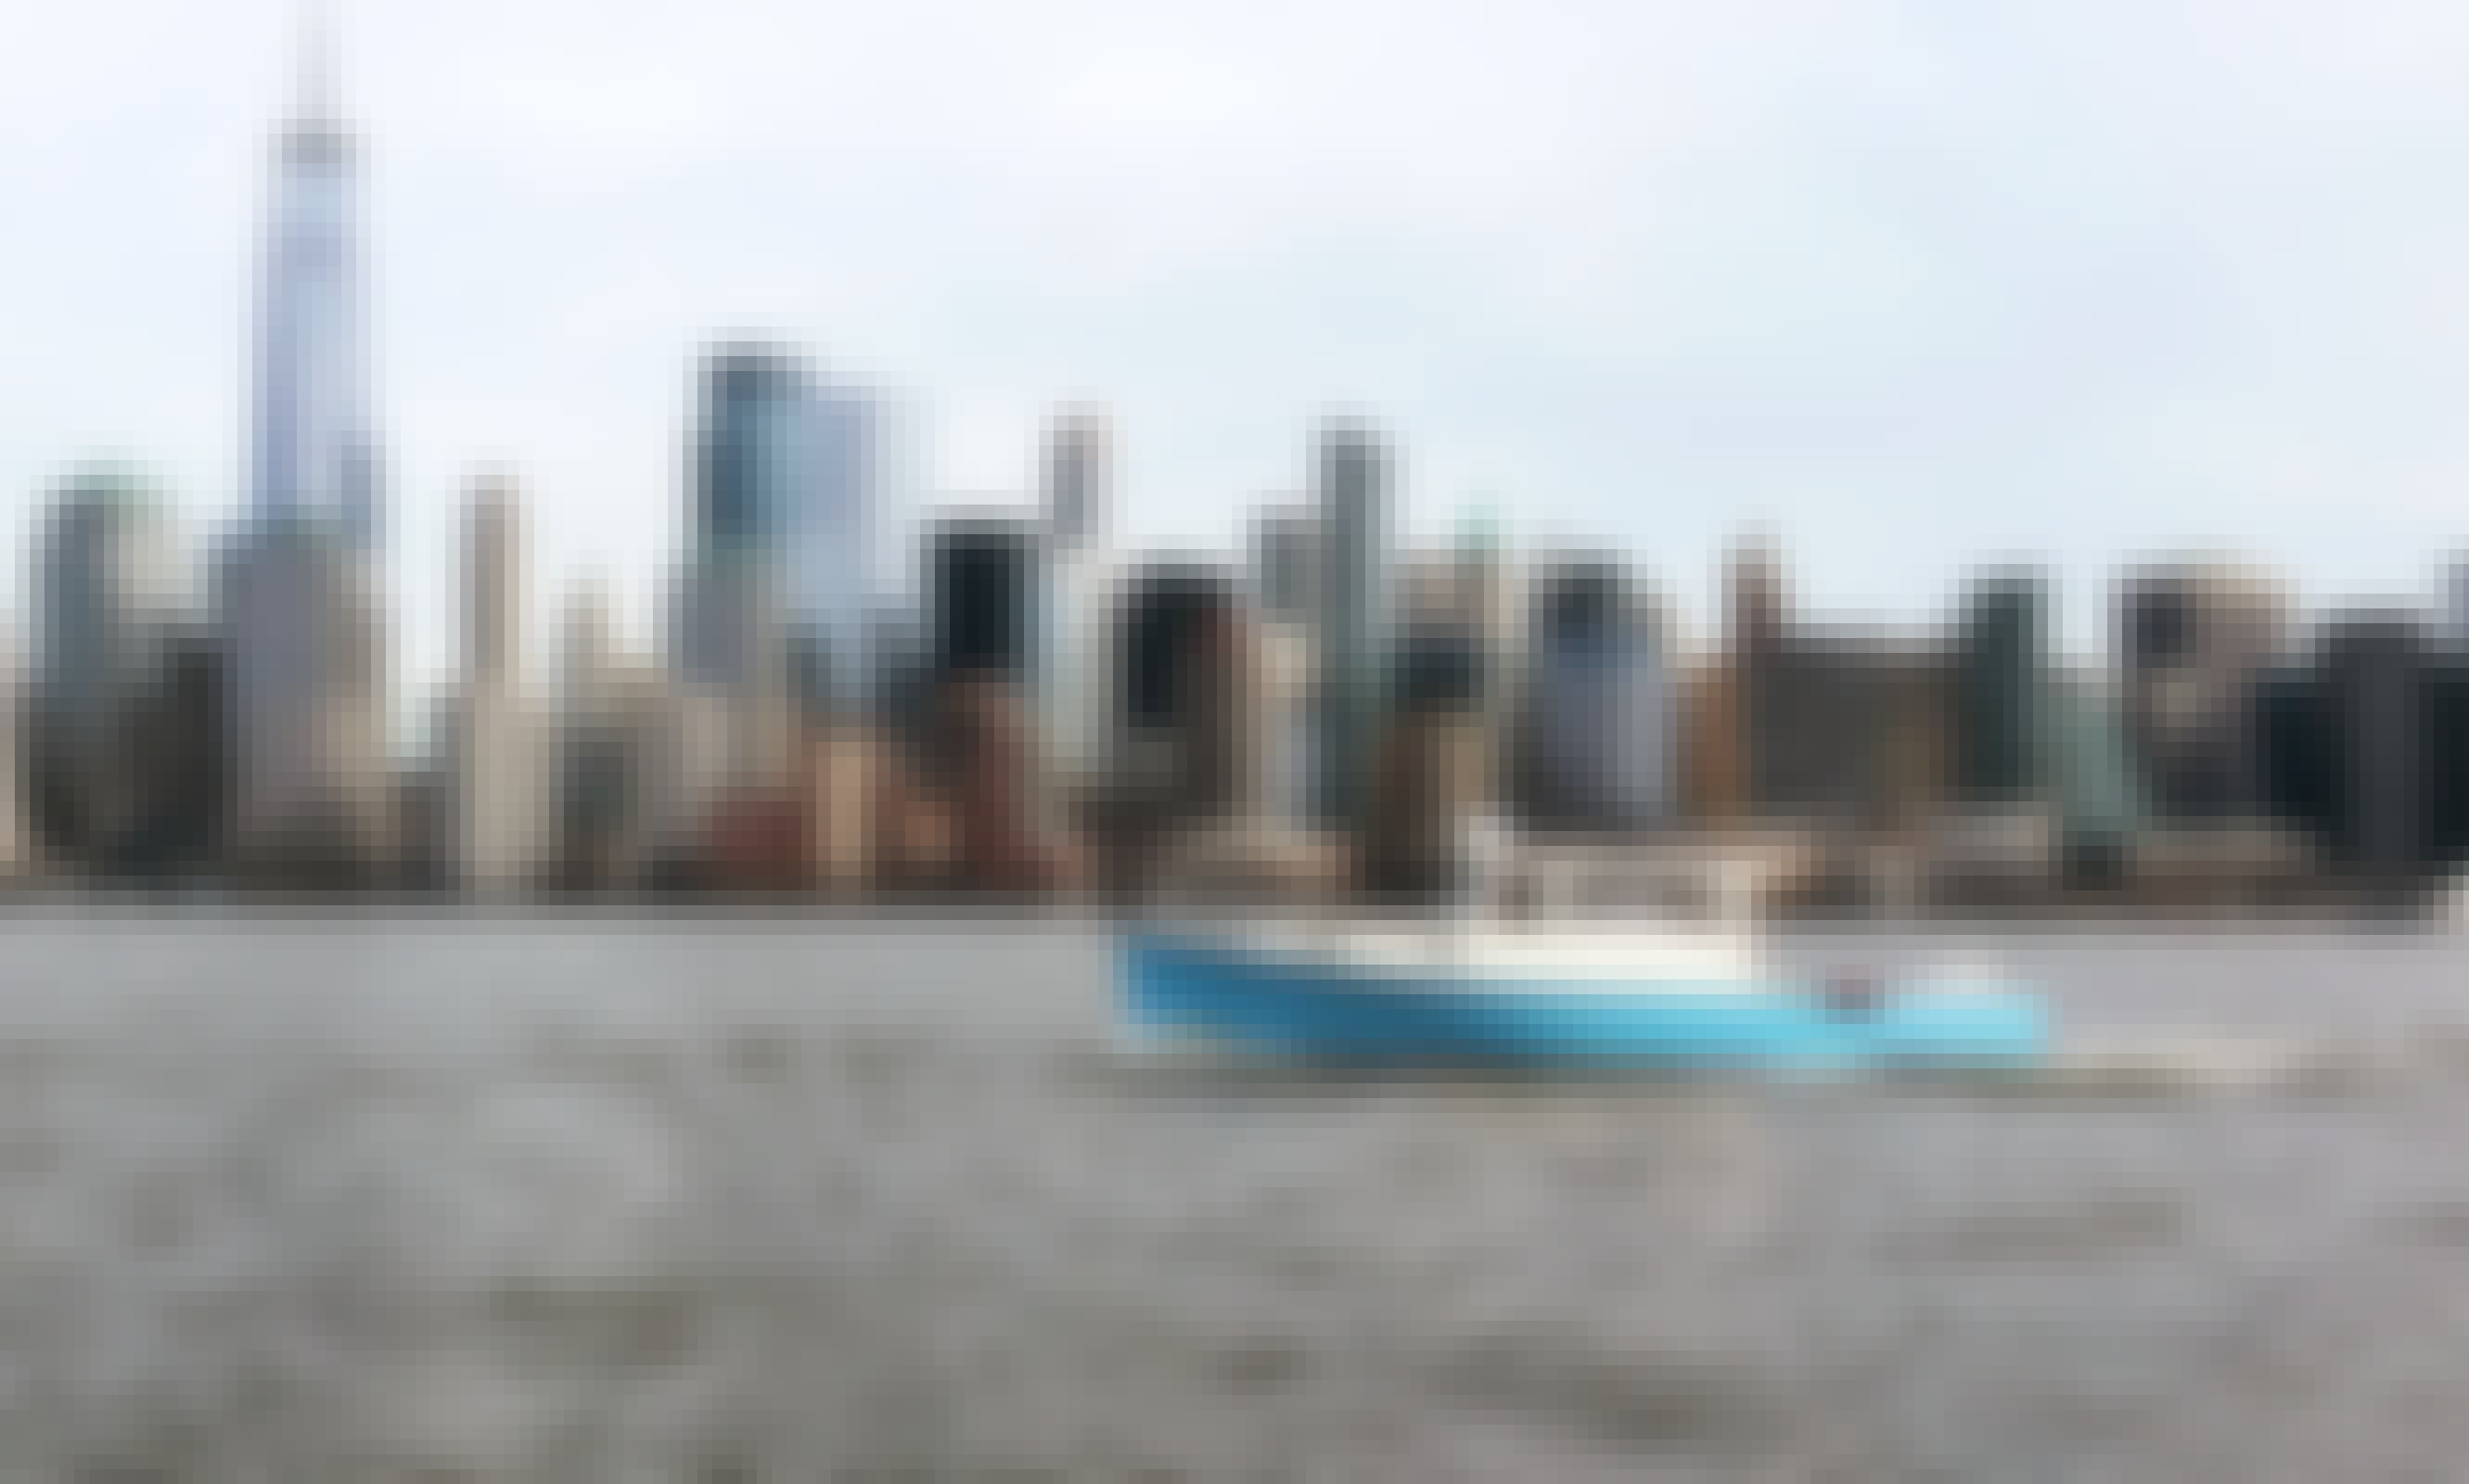 Classic Picnic Motorboat in New York Harbor